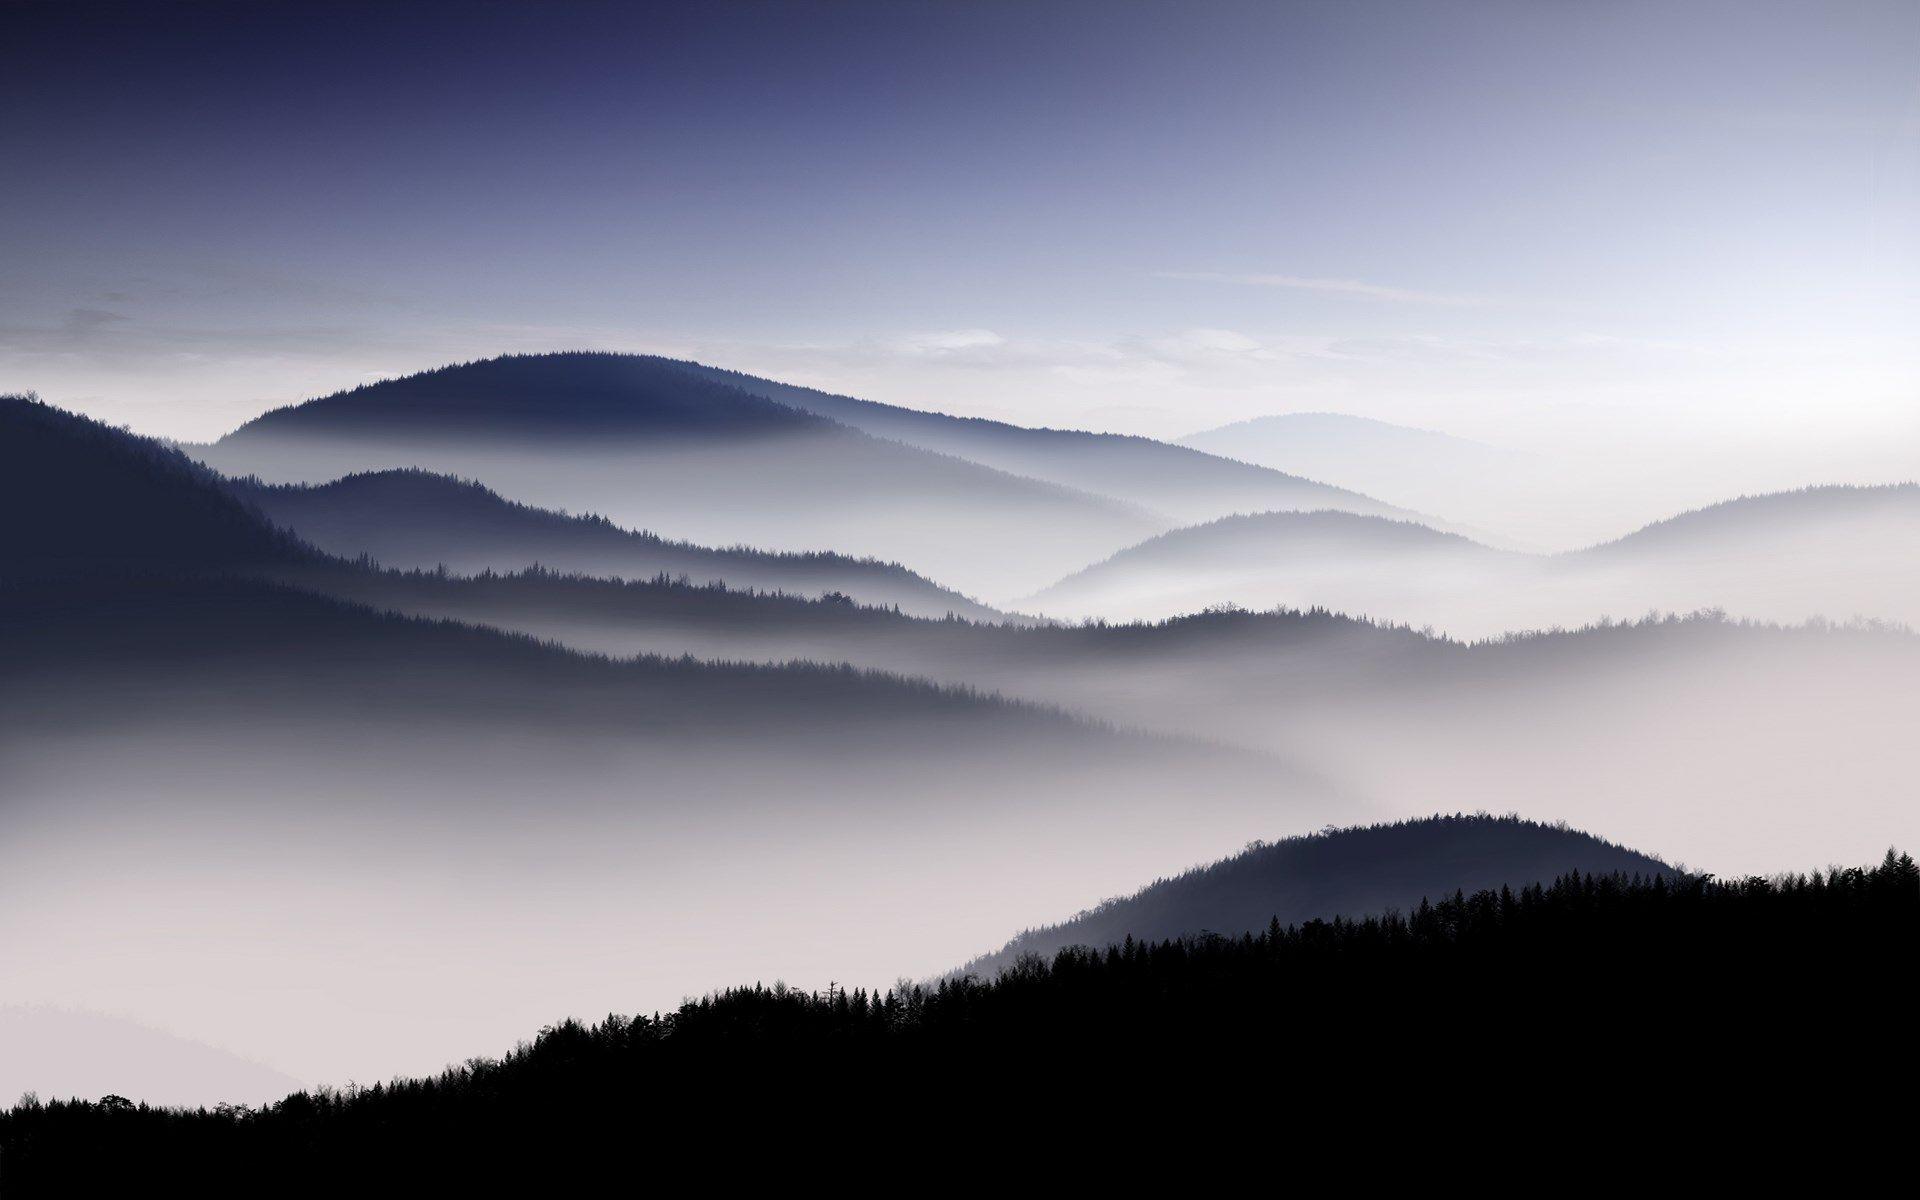 Nature Desktop Wallpaper Download 1920x1200 With Images Scenery Wallpaper Mountain Art Print Mountain Landscape